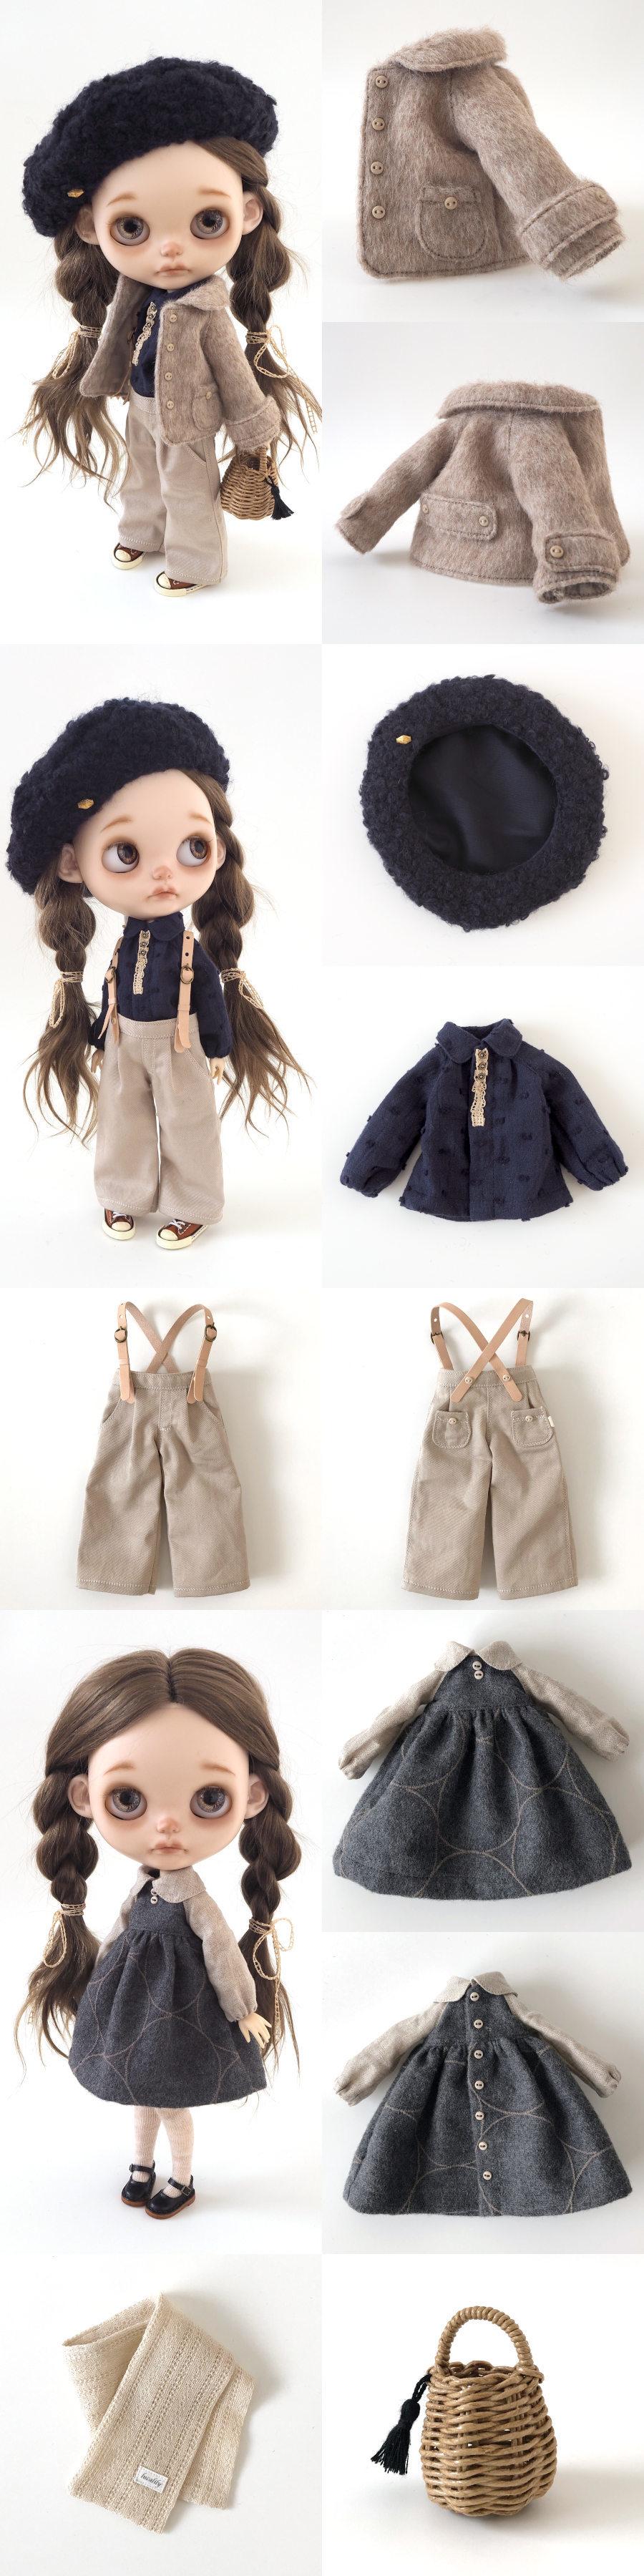 * lucalily * dolls clothes * Short Jacket set *_d0217189_23015890.jpg